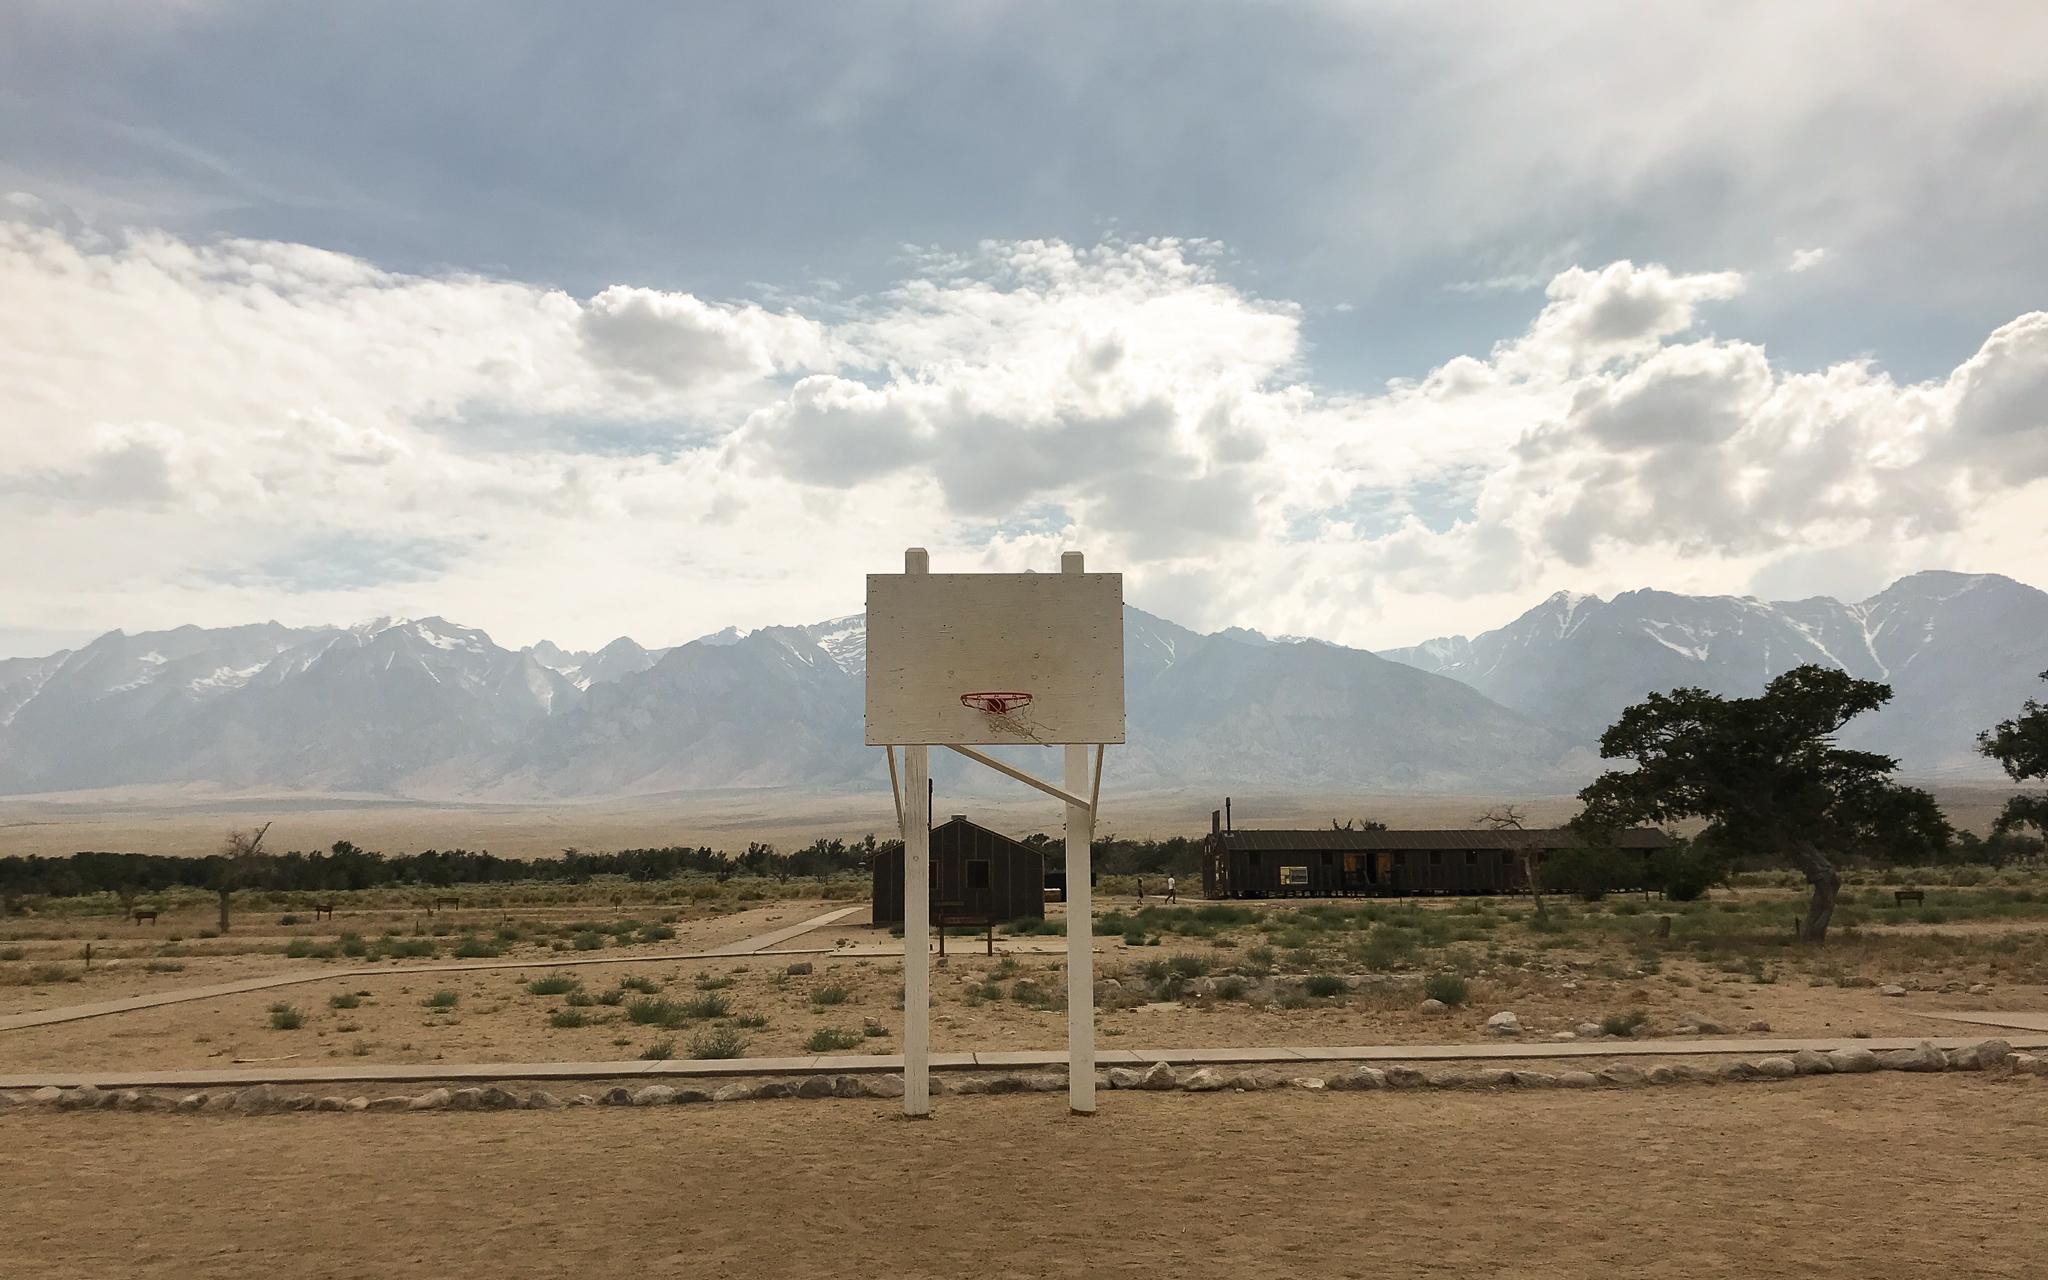 Manzanar Basketball Hoop